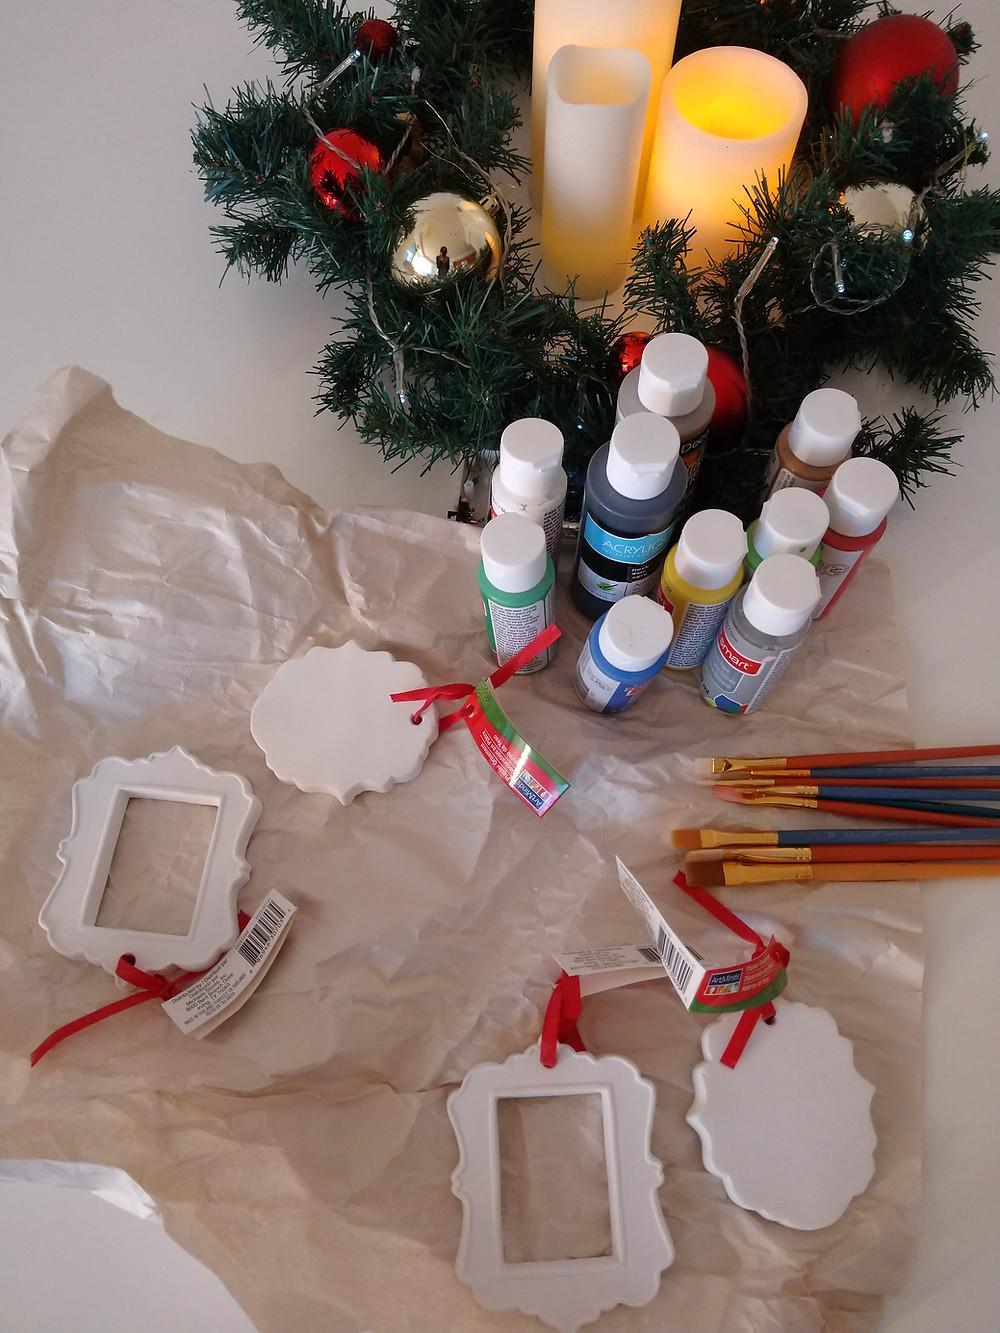 kids craft ornament decorating